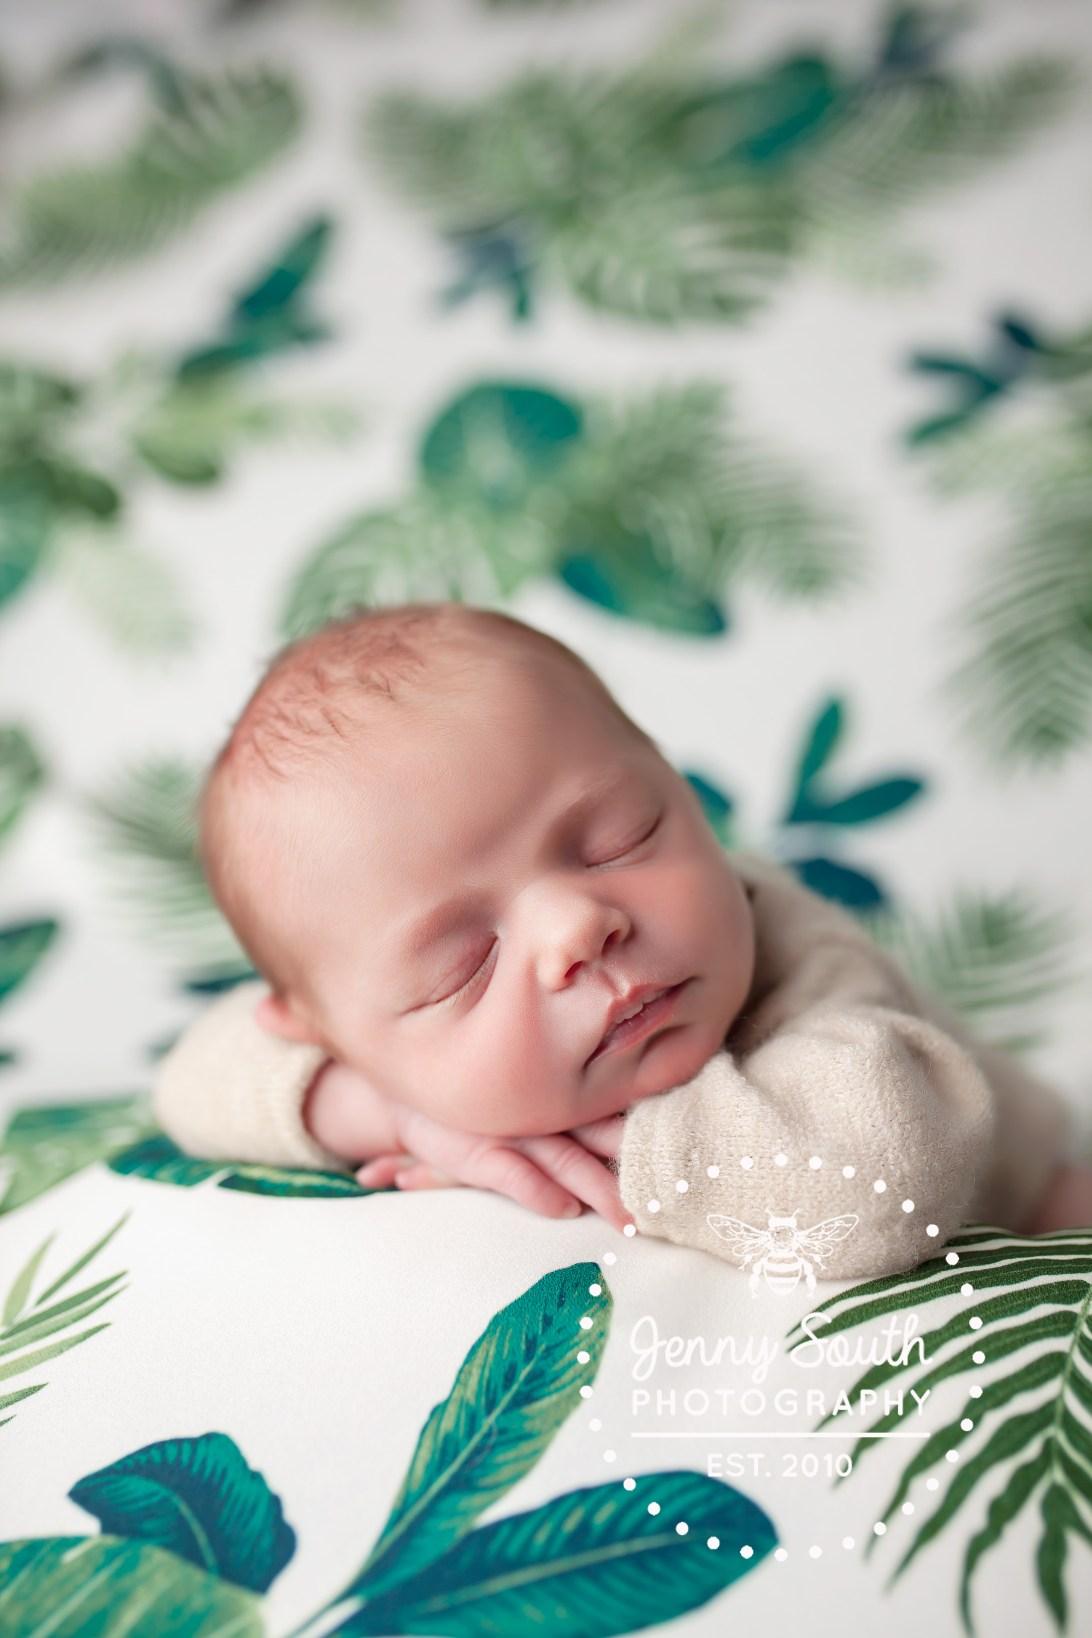 A Newborn lies sleeping on her hands against a botanical green and cream backdrop